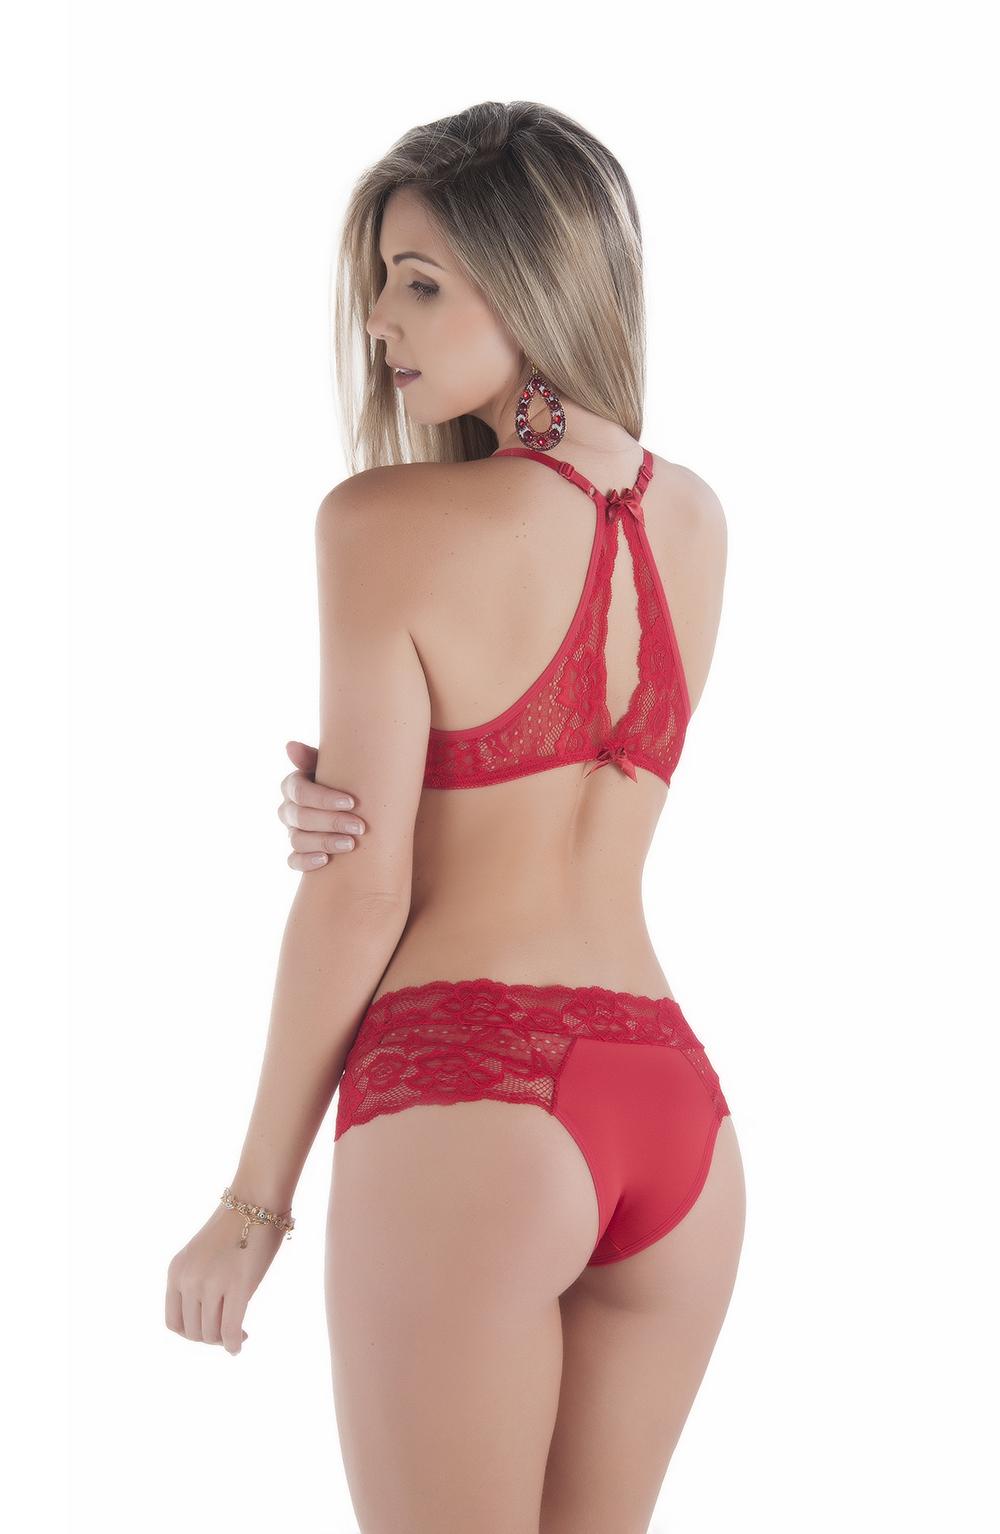 Sexylk com